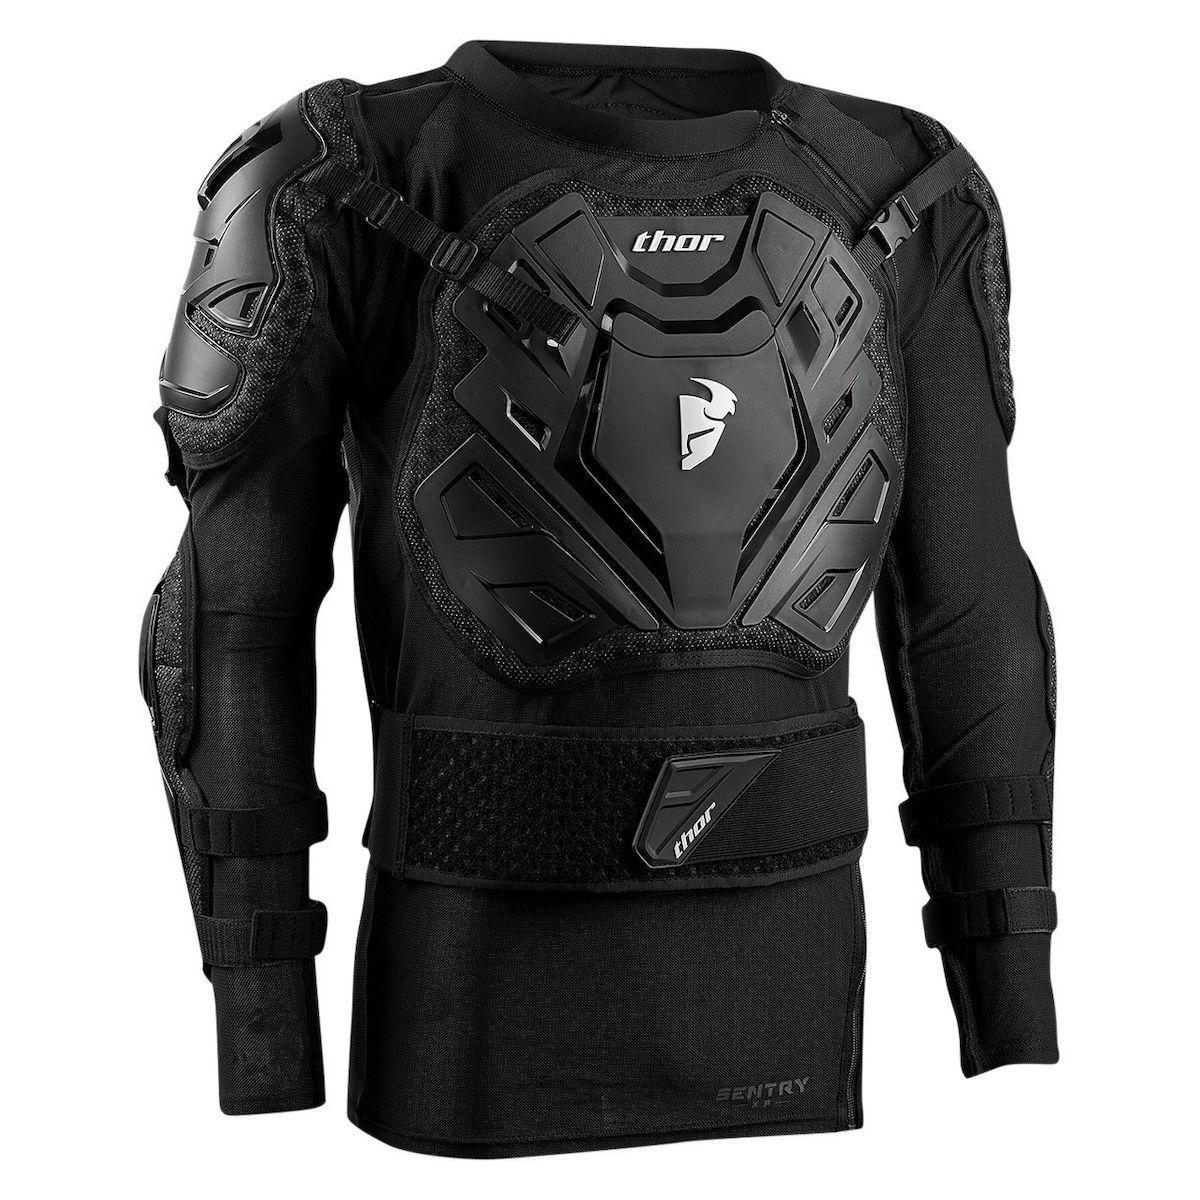 Thor MX Gear & Motocross Apparel